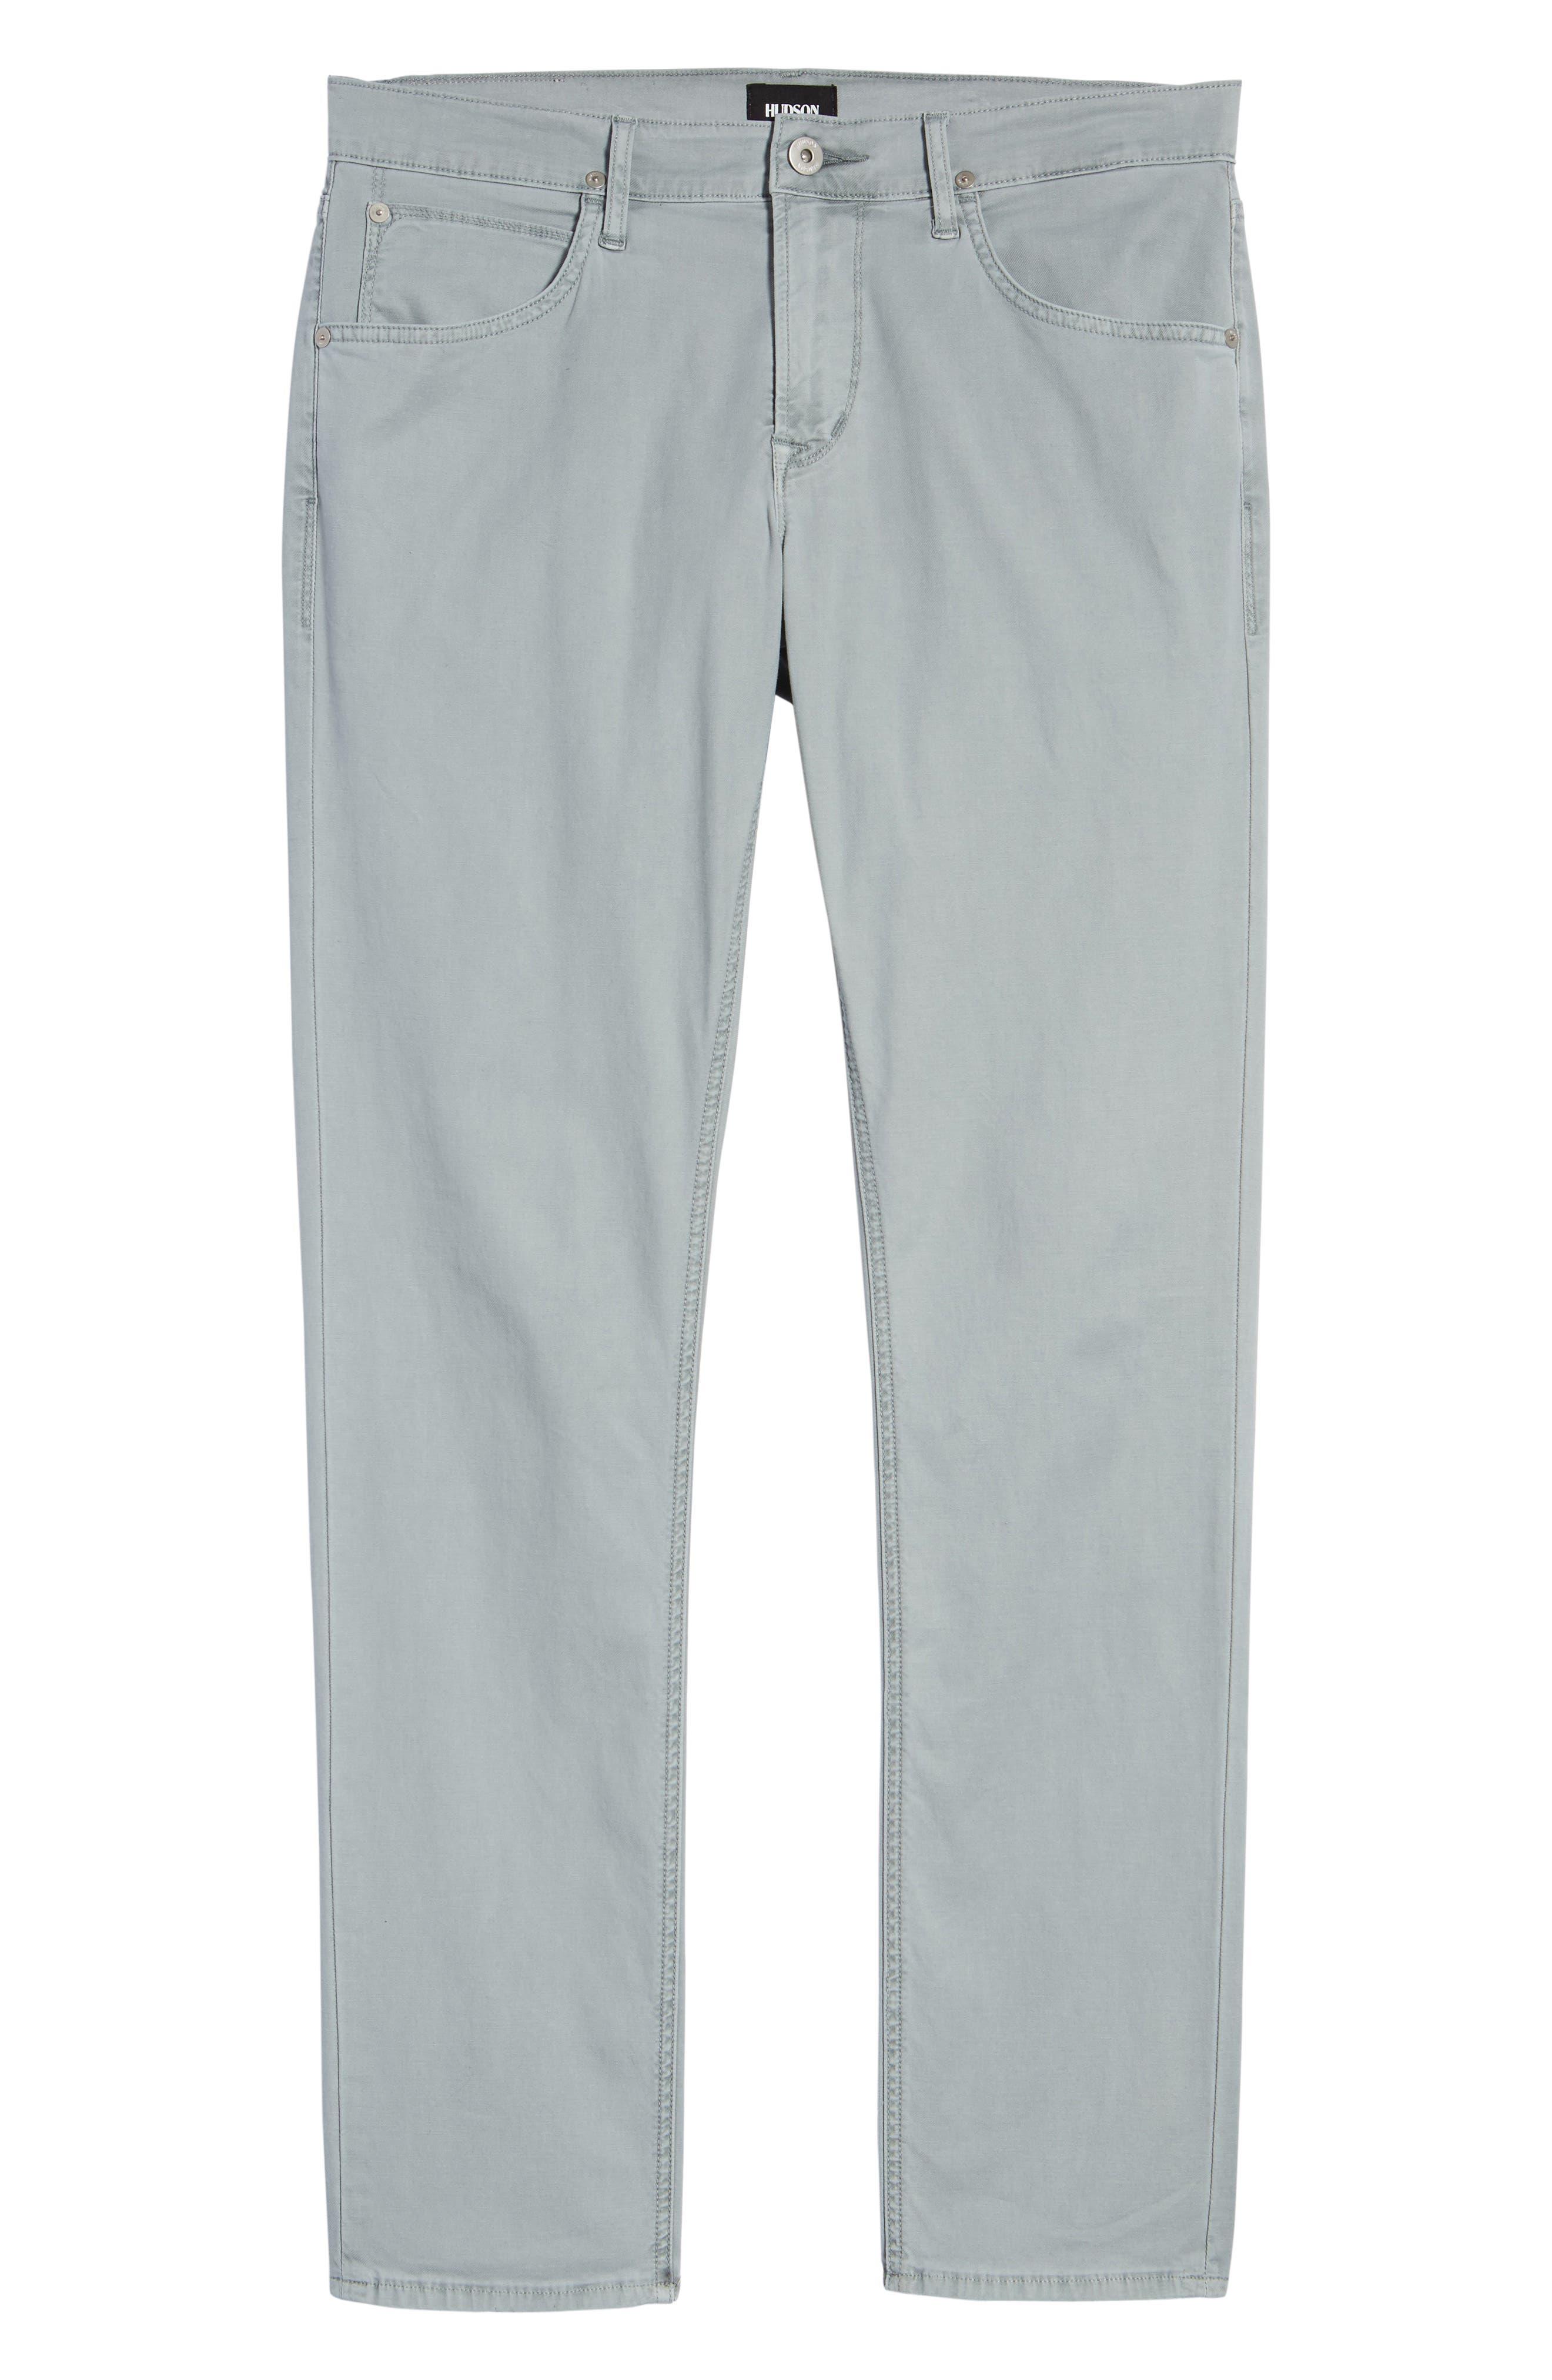 HUDSON JEANS,                             Blake Slim Fit Jeans,                             Alternate thumbnail 6, color,                             400